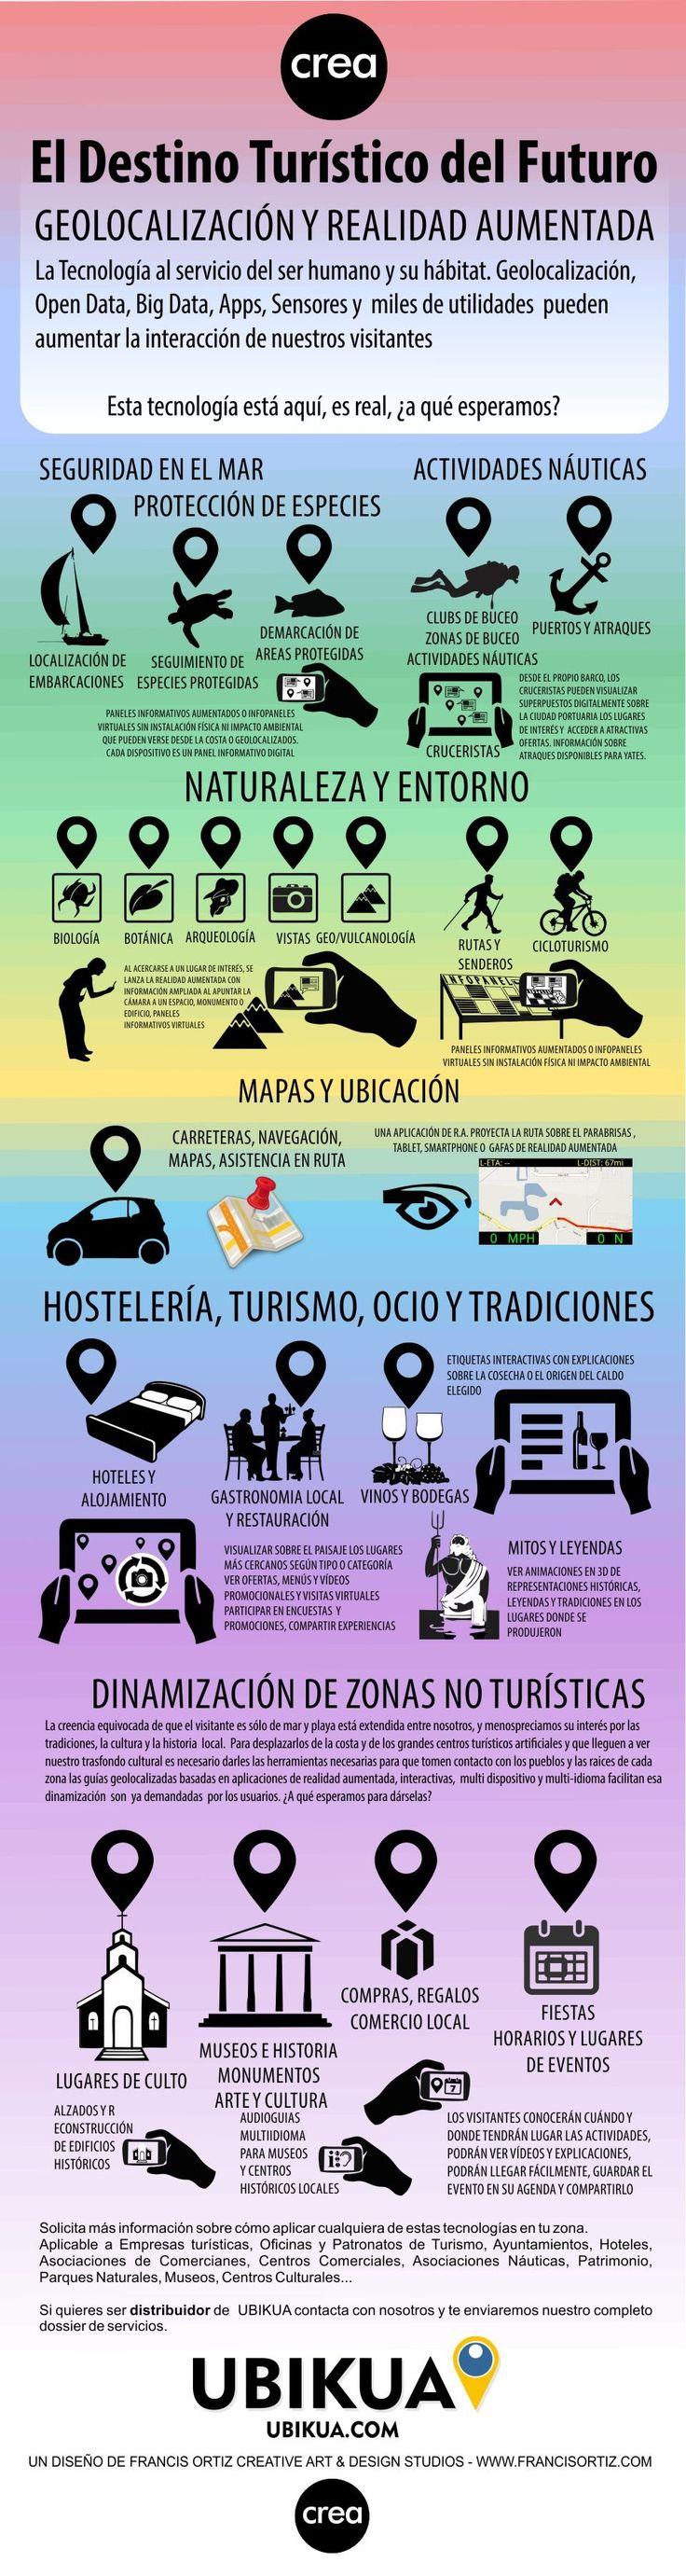 #Geolocalizacion y #RealidadAumentada para el Destino Turistico, infografía de Francis Ortiz para #Ubikua www.ubikua.com